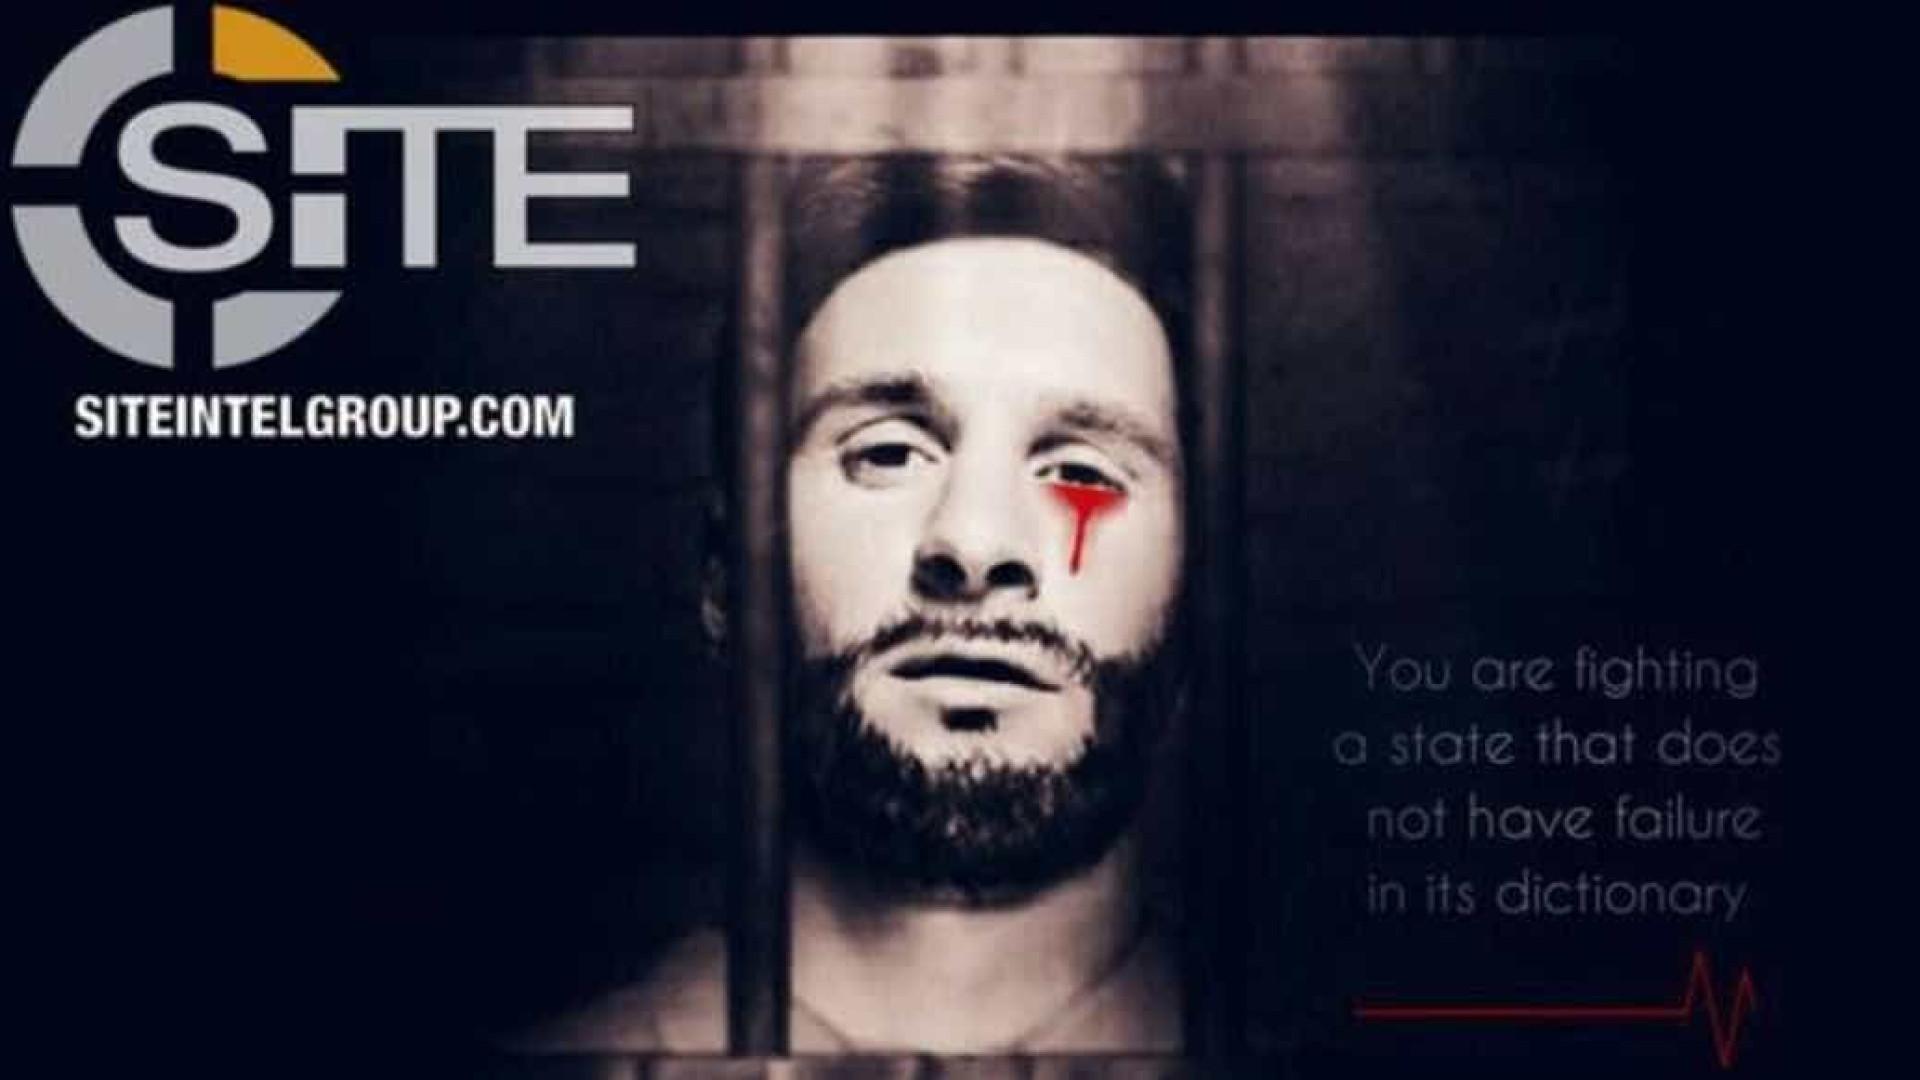 Messi a sangrar: Estado Islâmico promete ataques durante o Mundial